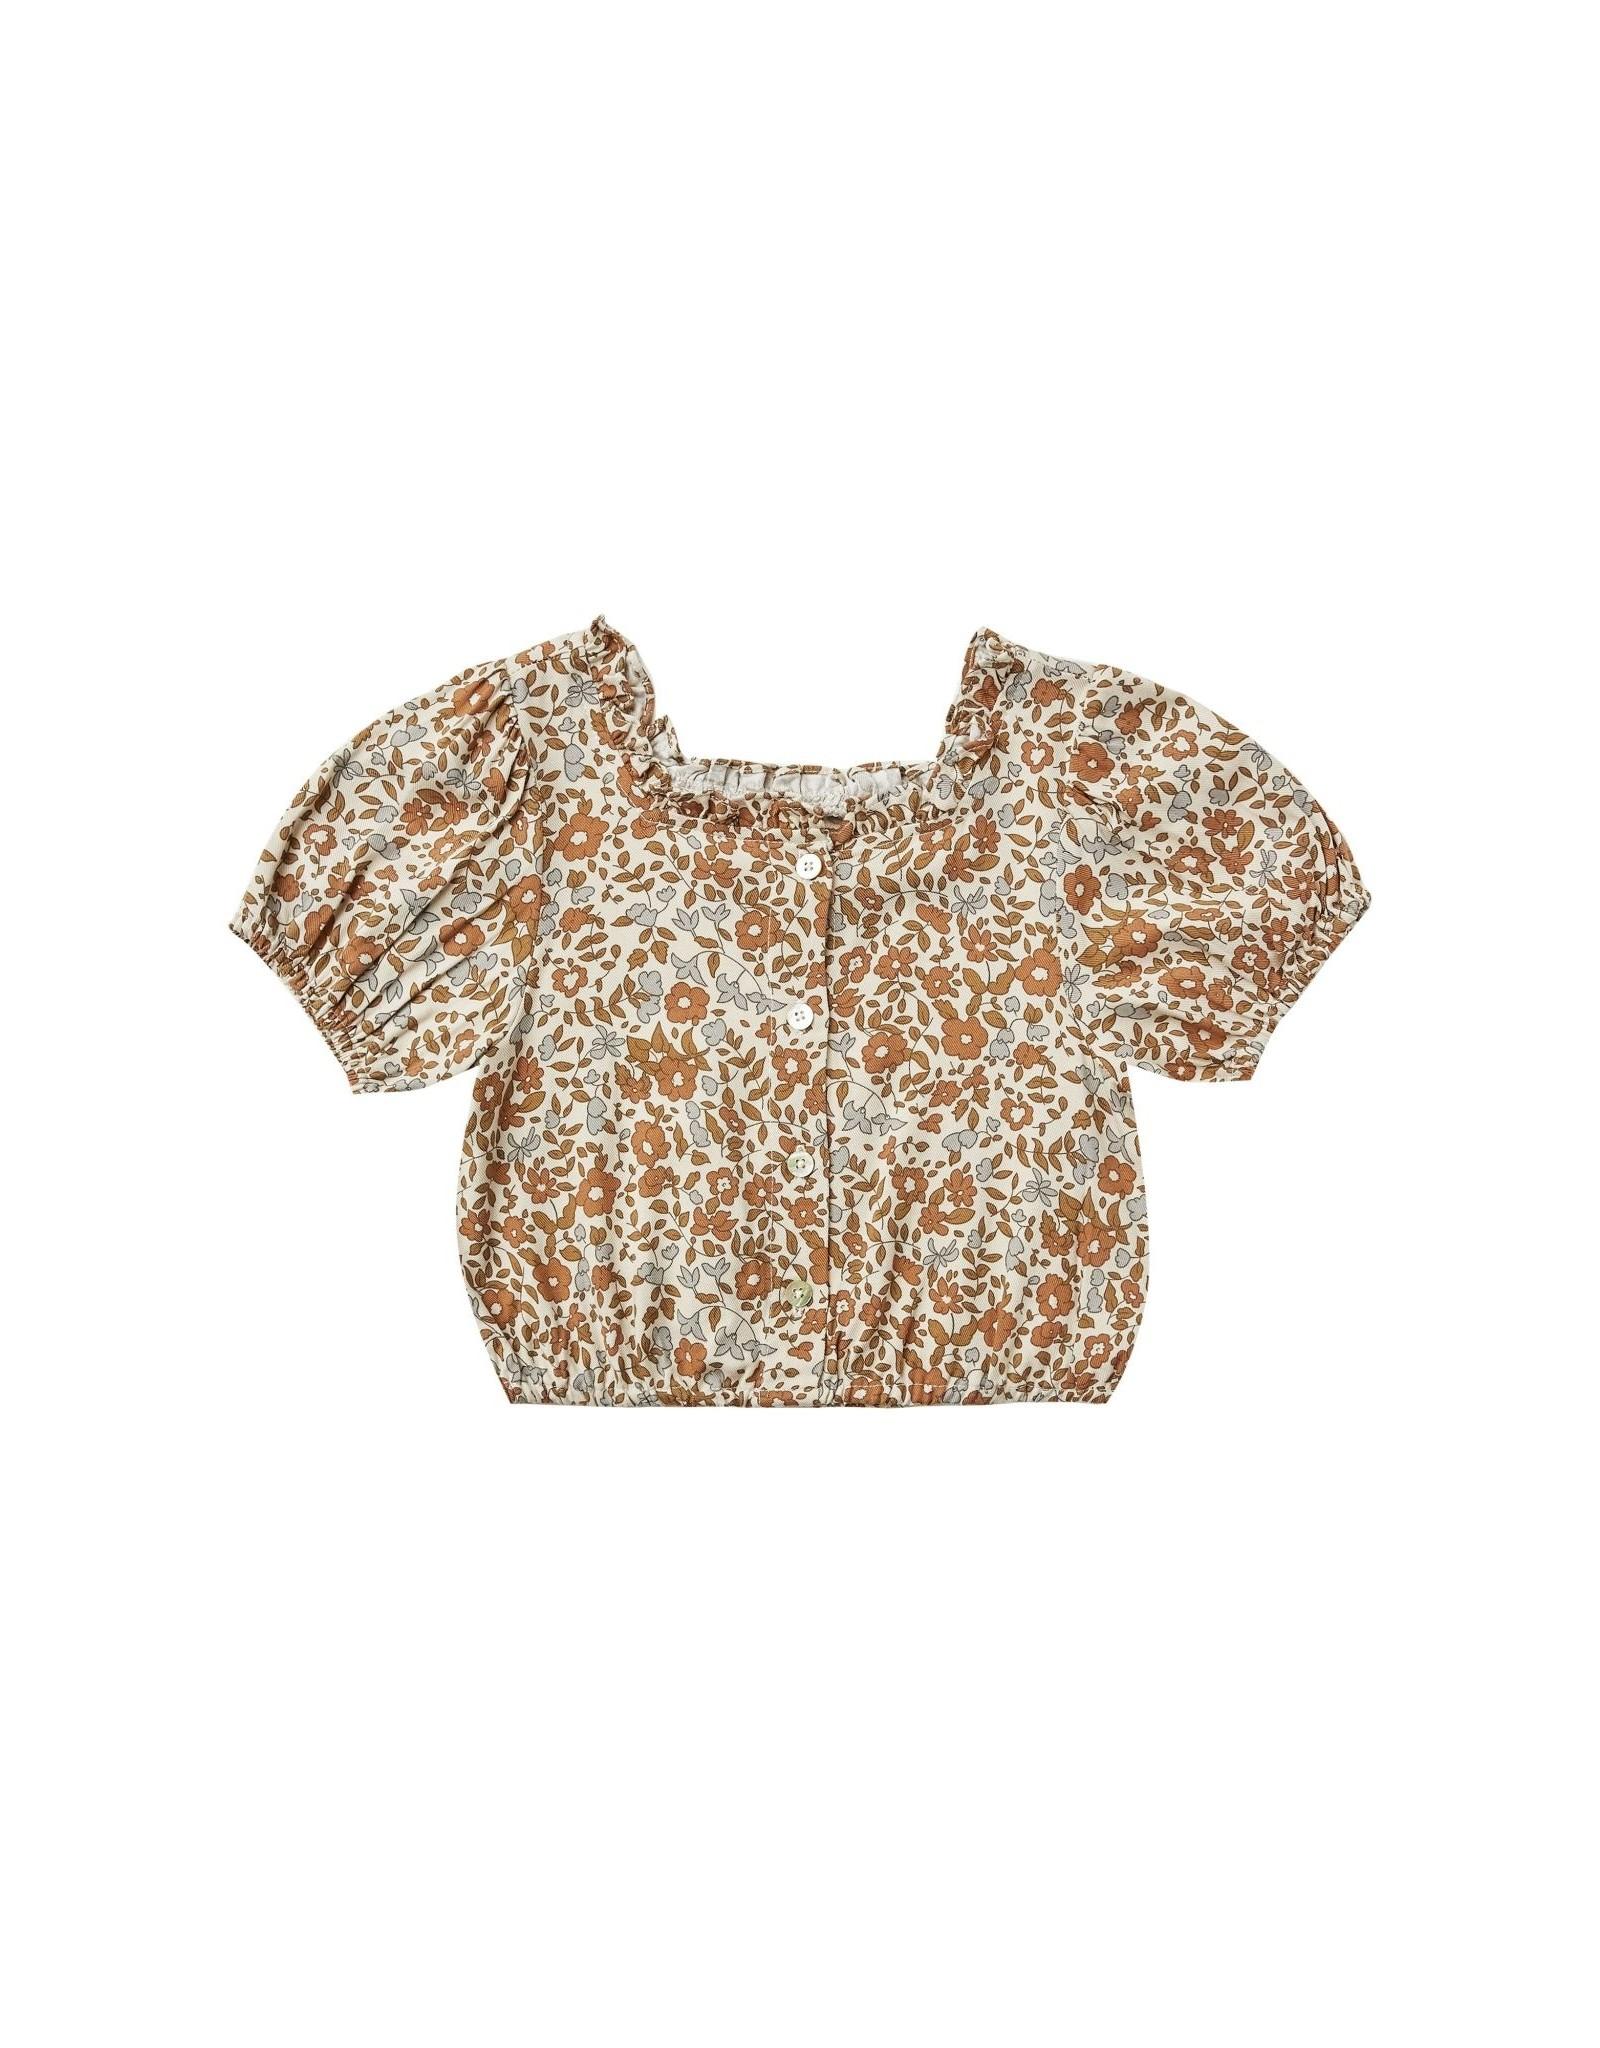 Rylee and Cru dylan blouse- bloom